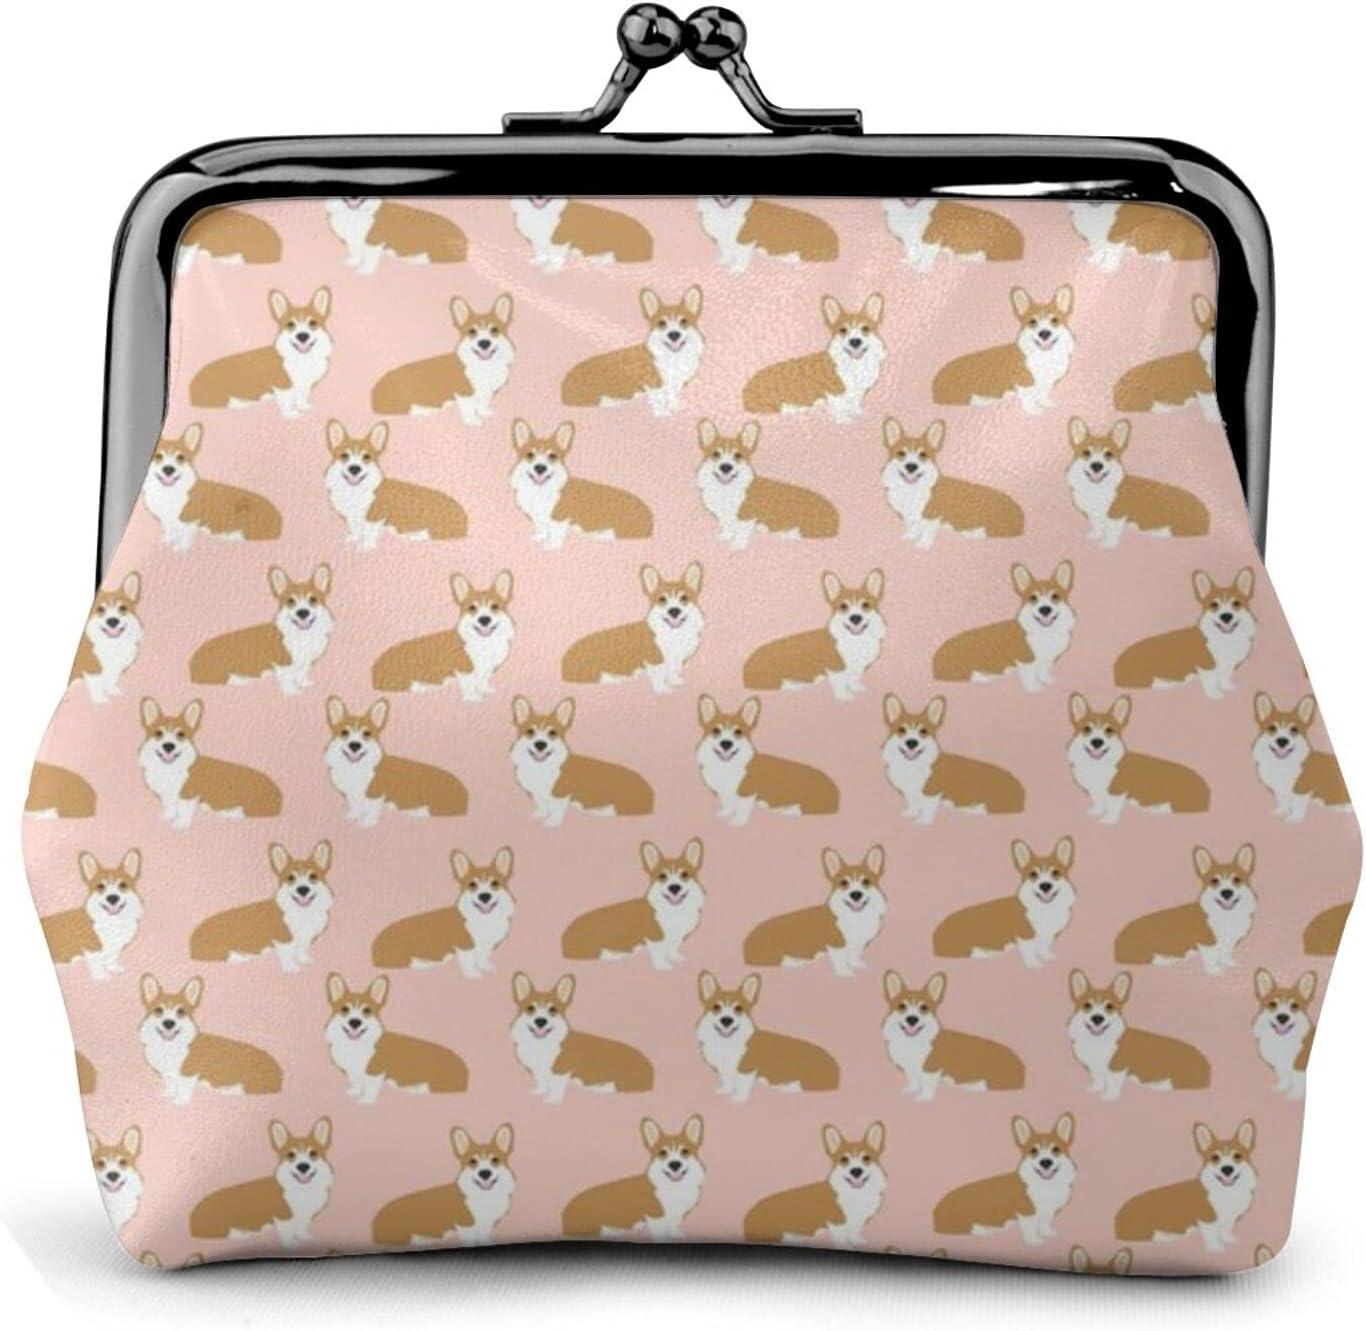 Corgi Corgis Girls 1692 Leather Coin Purse Kiss Lock Change Pouch Vintage Clasp Closure Buckle Wallet Small Women Gift